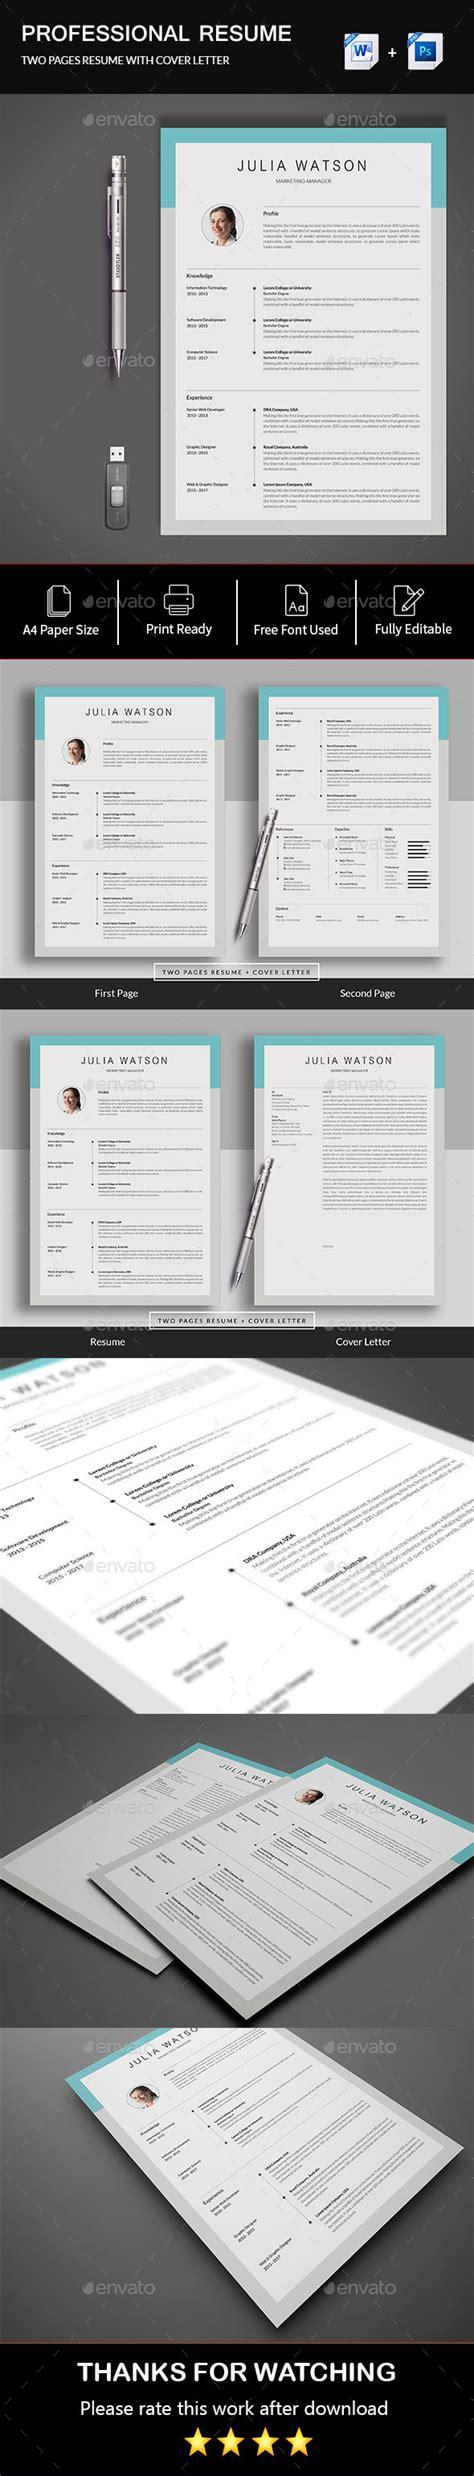 free build resume professional retail resume resume